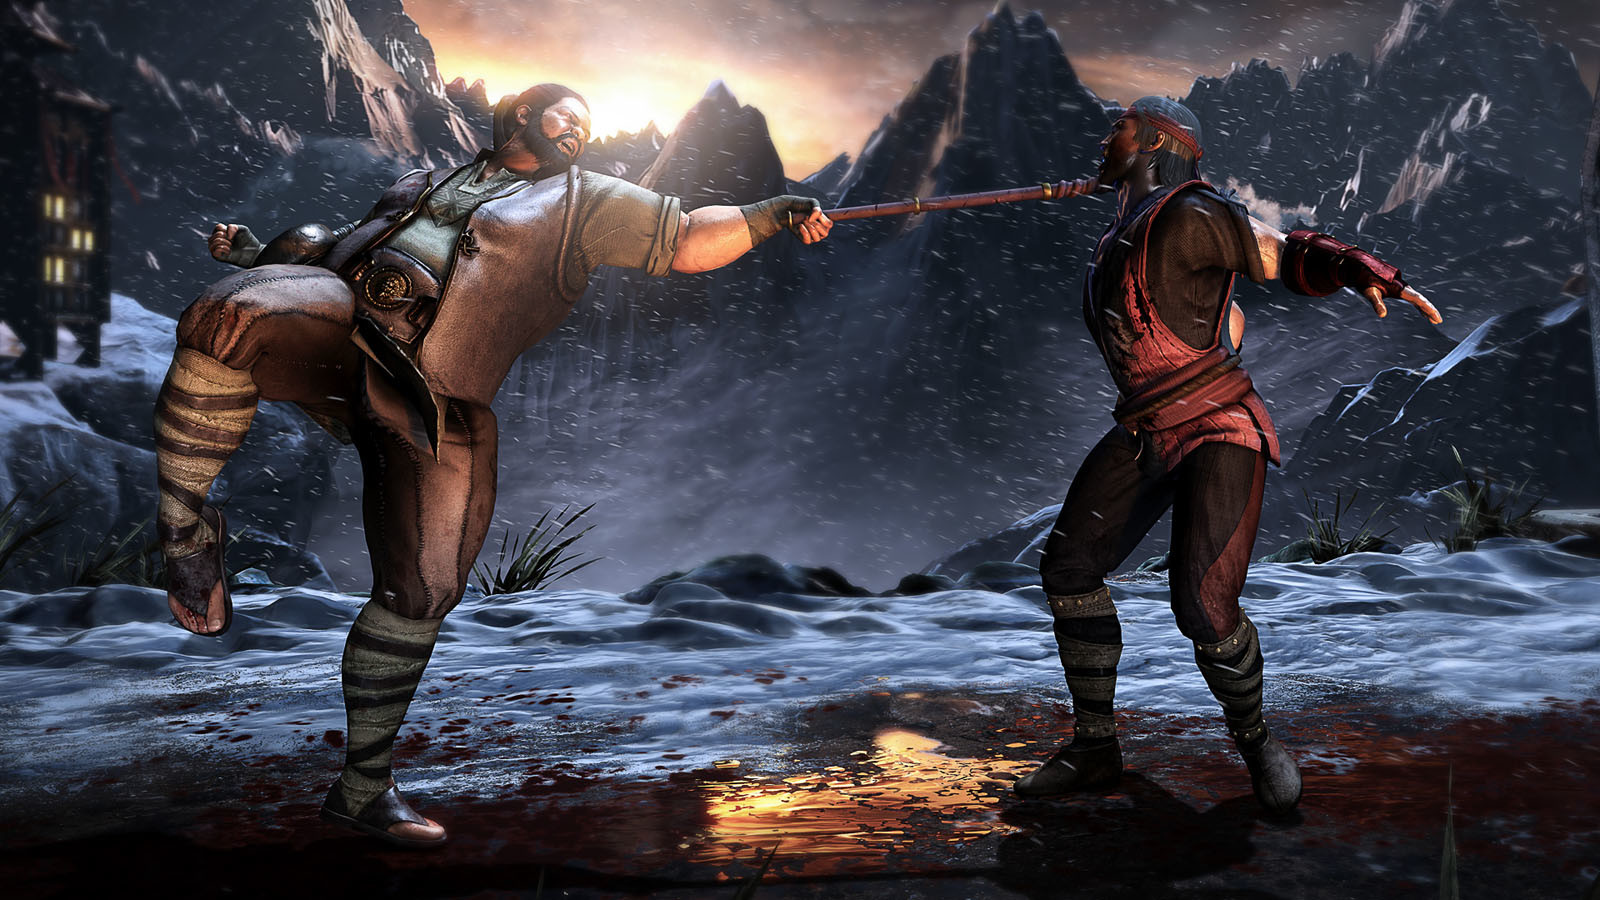 Mortal Kombat X Kombat Pack 2 Steam Key For Pc Buy Now